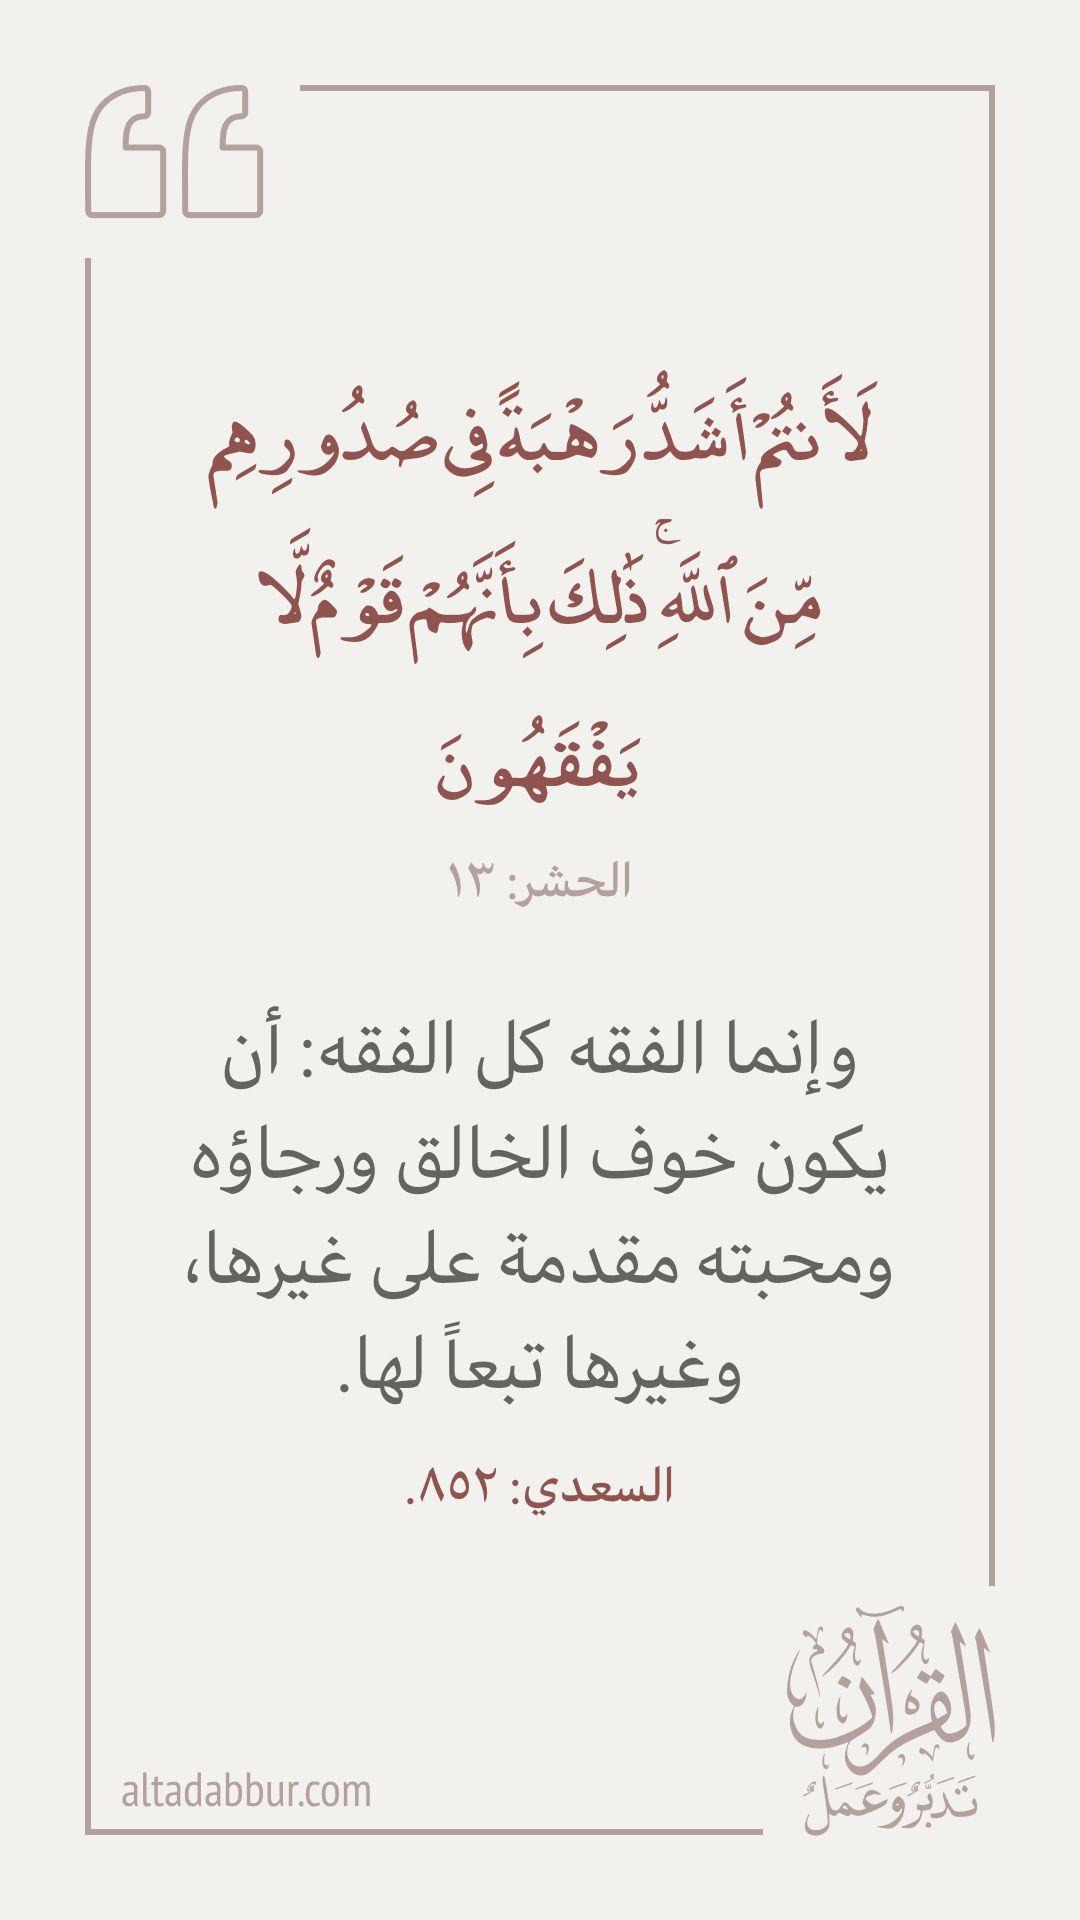 Pin By On قرآن تفسير وتدب ر Quotes Quran Imam Ali